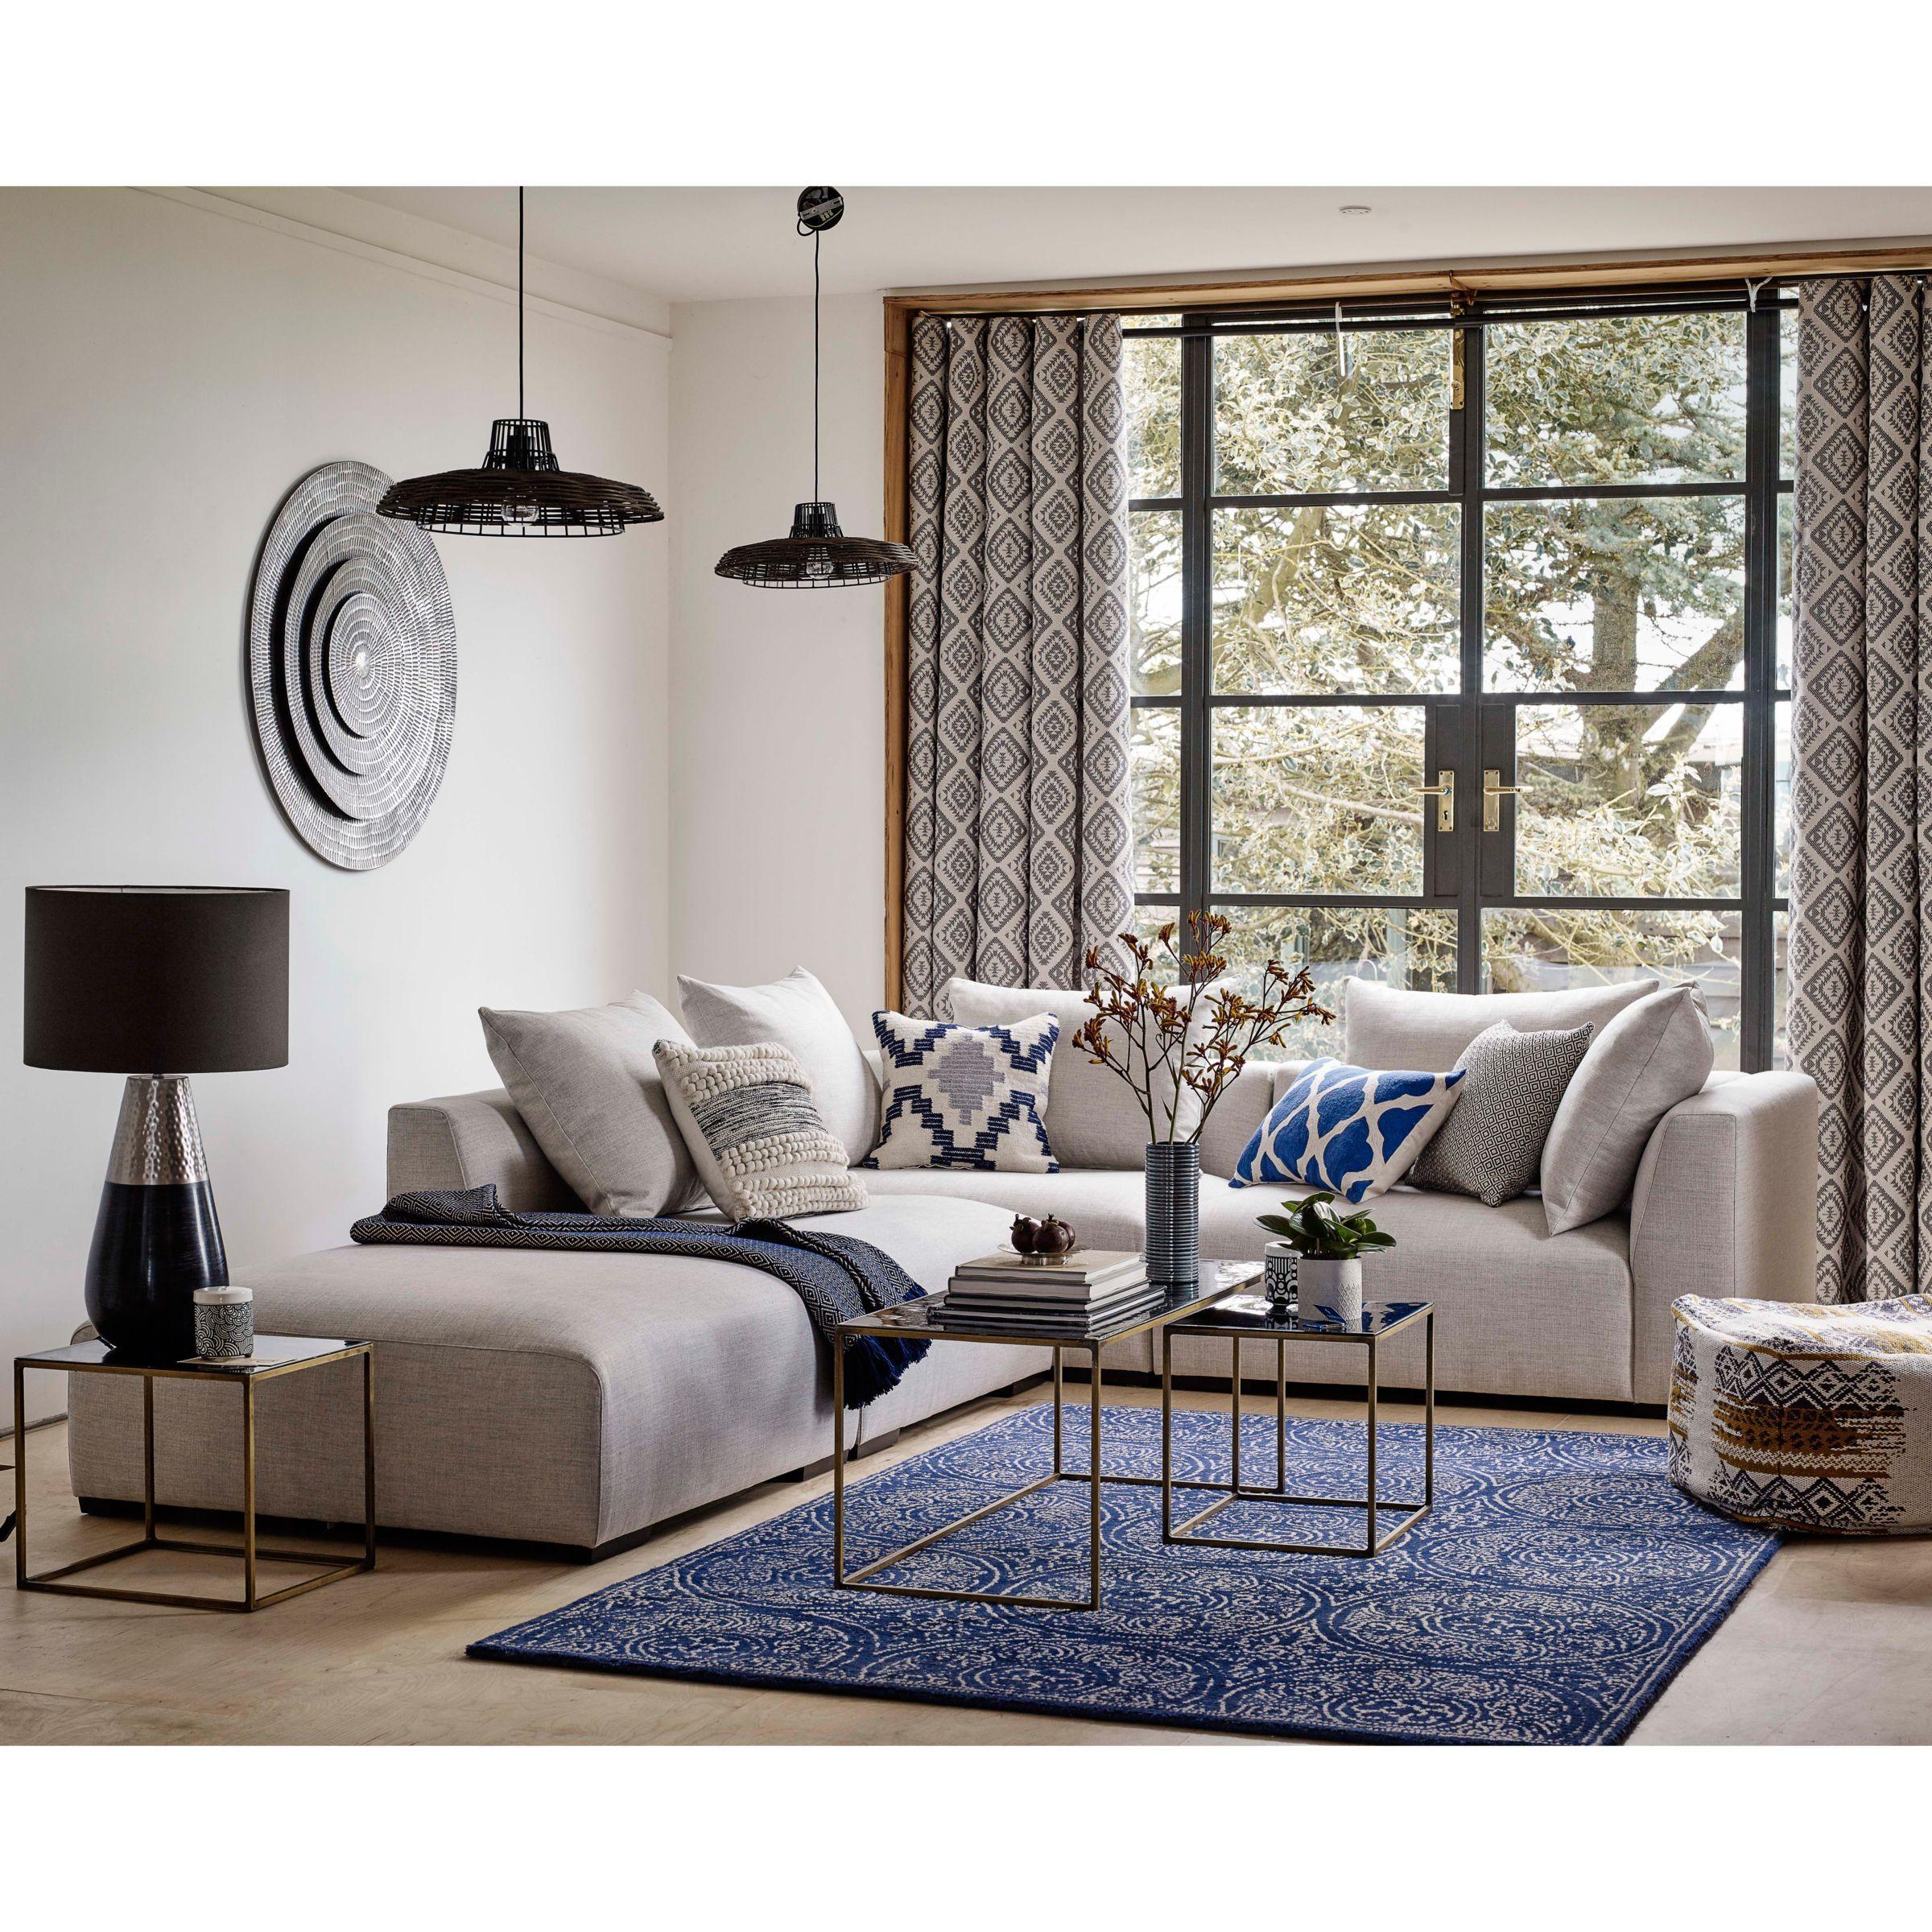 John Lewis Partners Tokyo Lhf Grand Modular Arm Unit Indian Living Rooms Traditional Sofa Sectional Sofa